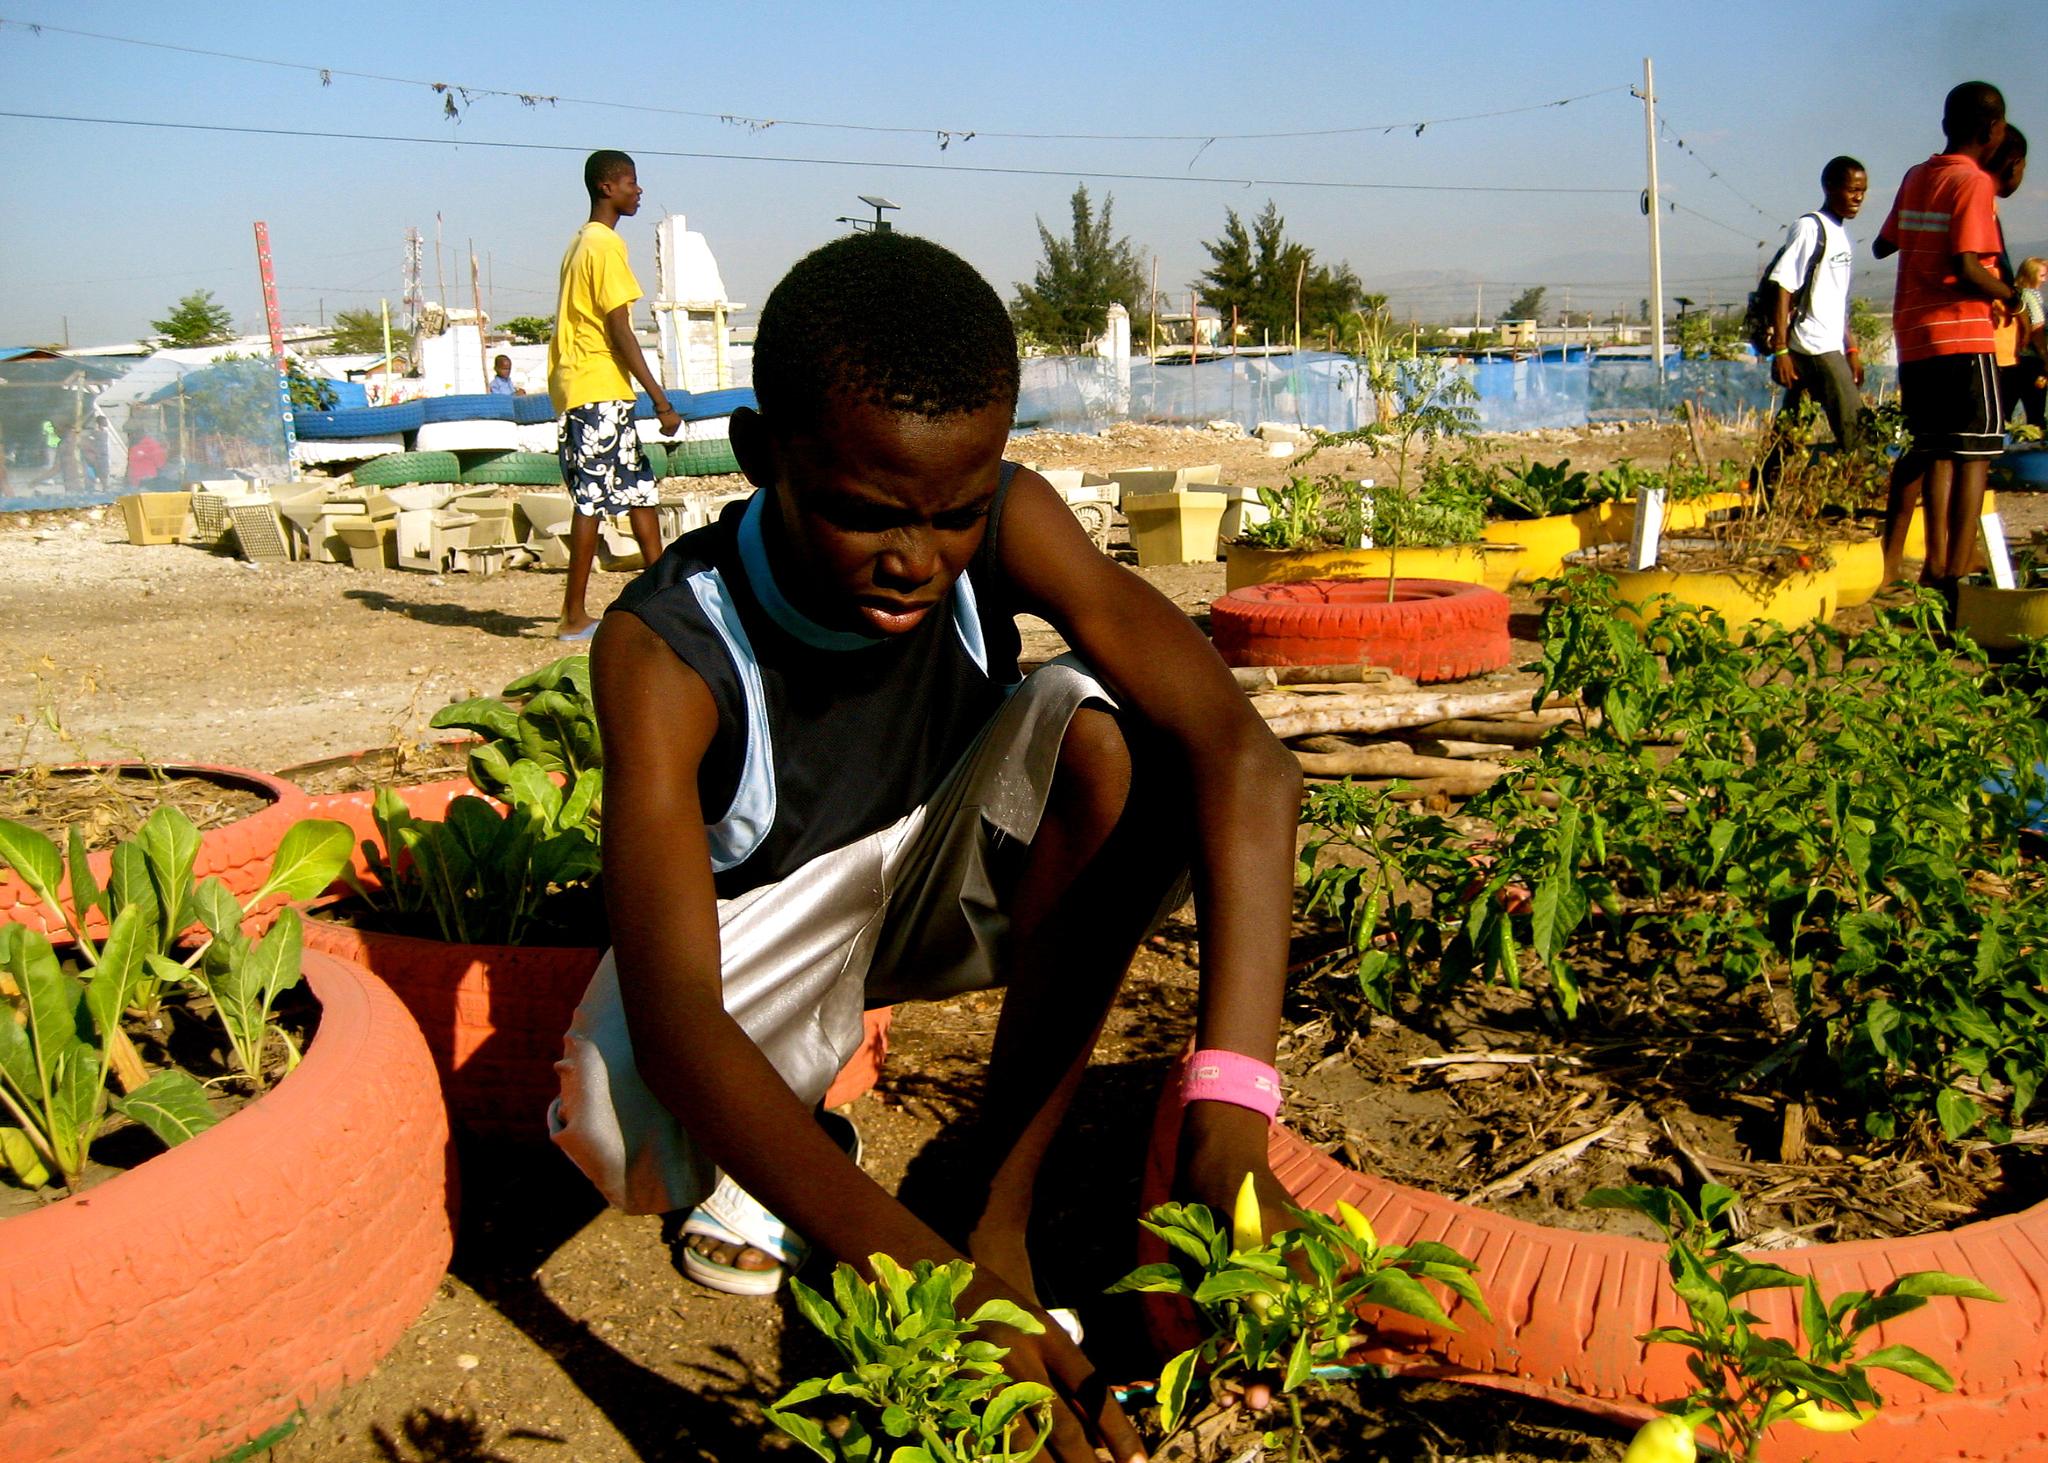 Boy planting garden (Artistsactivists/Flickr)